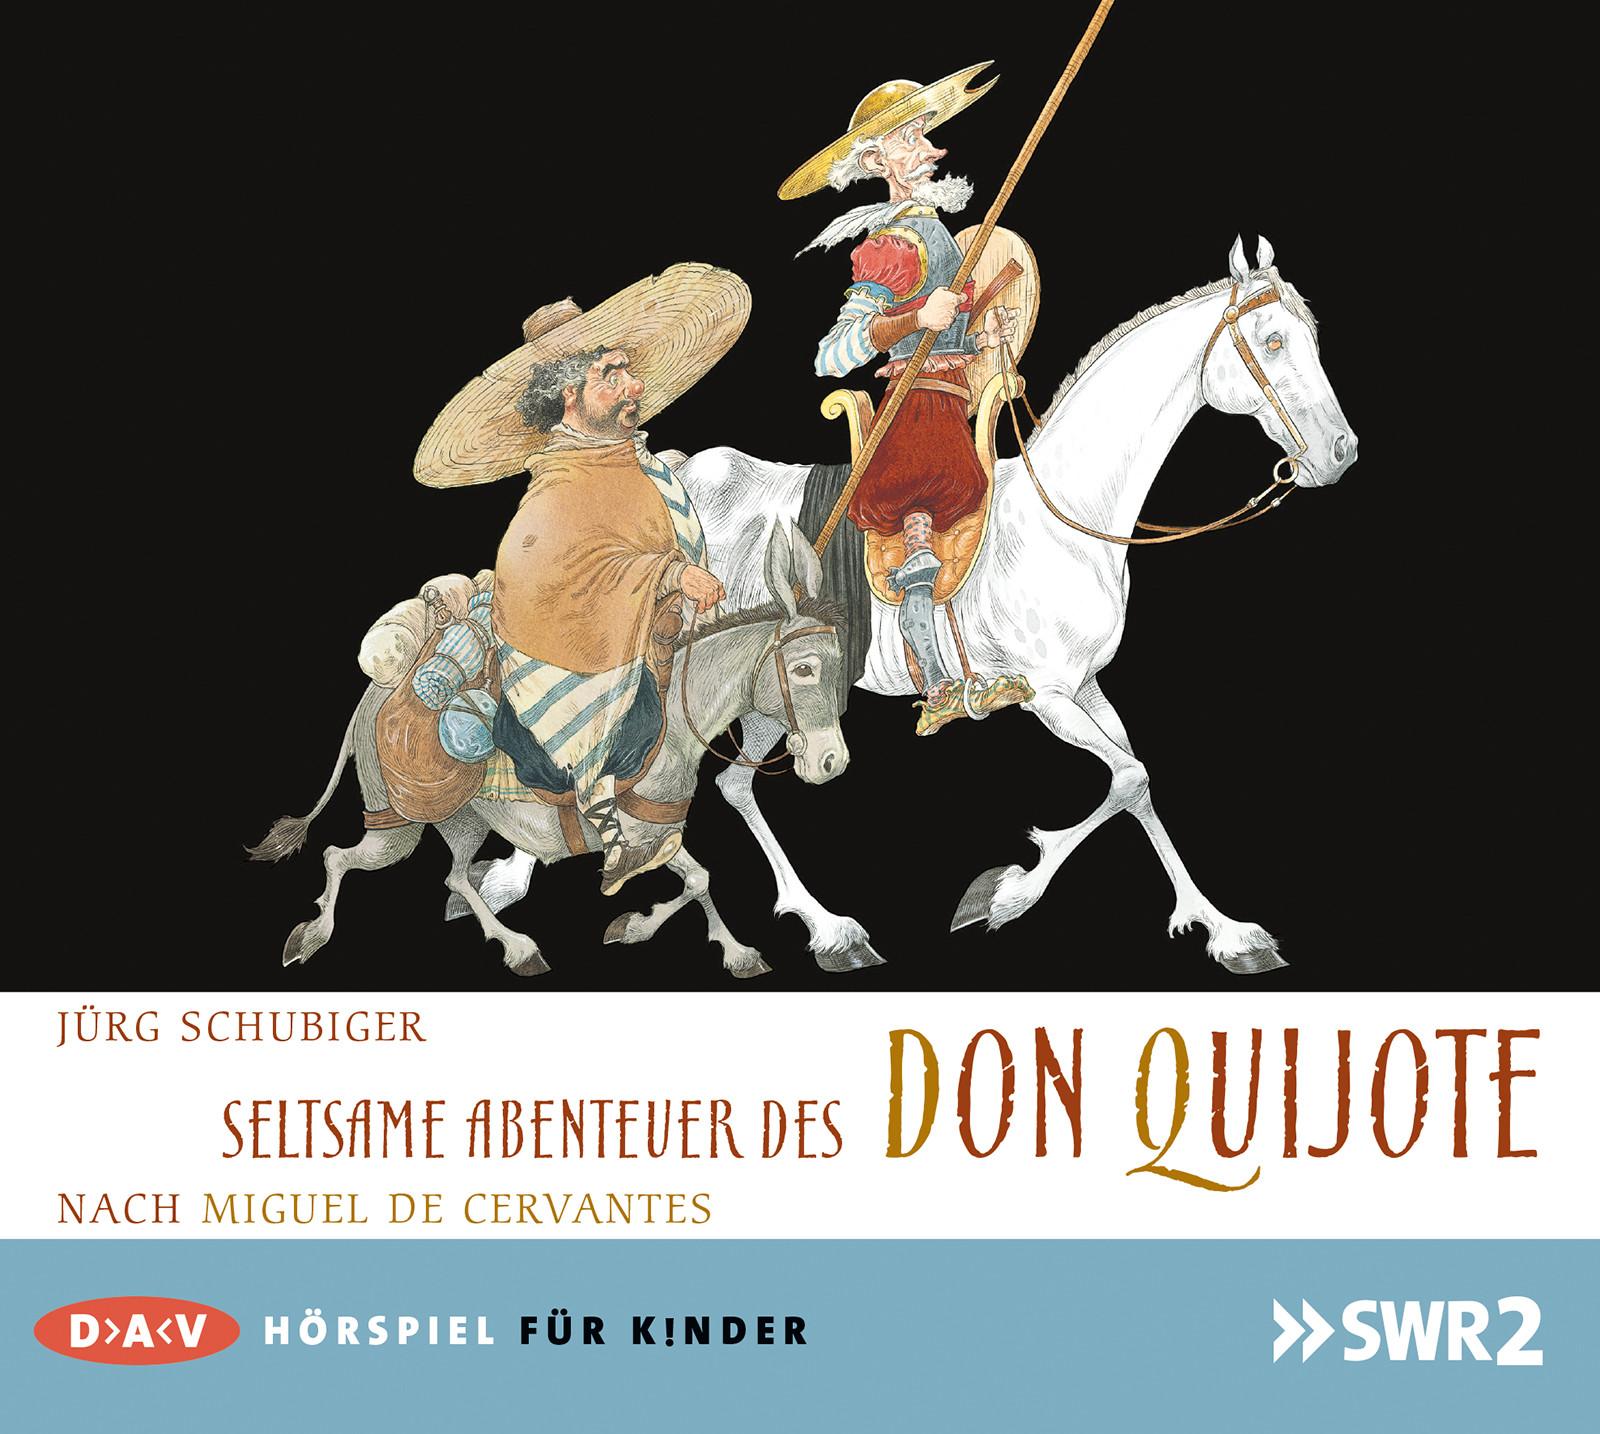 Jörg Schubiger - Seltsame Abenteuer des Don Quijote (SWR2-Hörspiel)